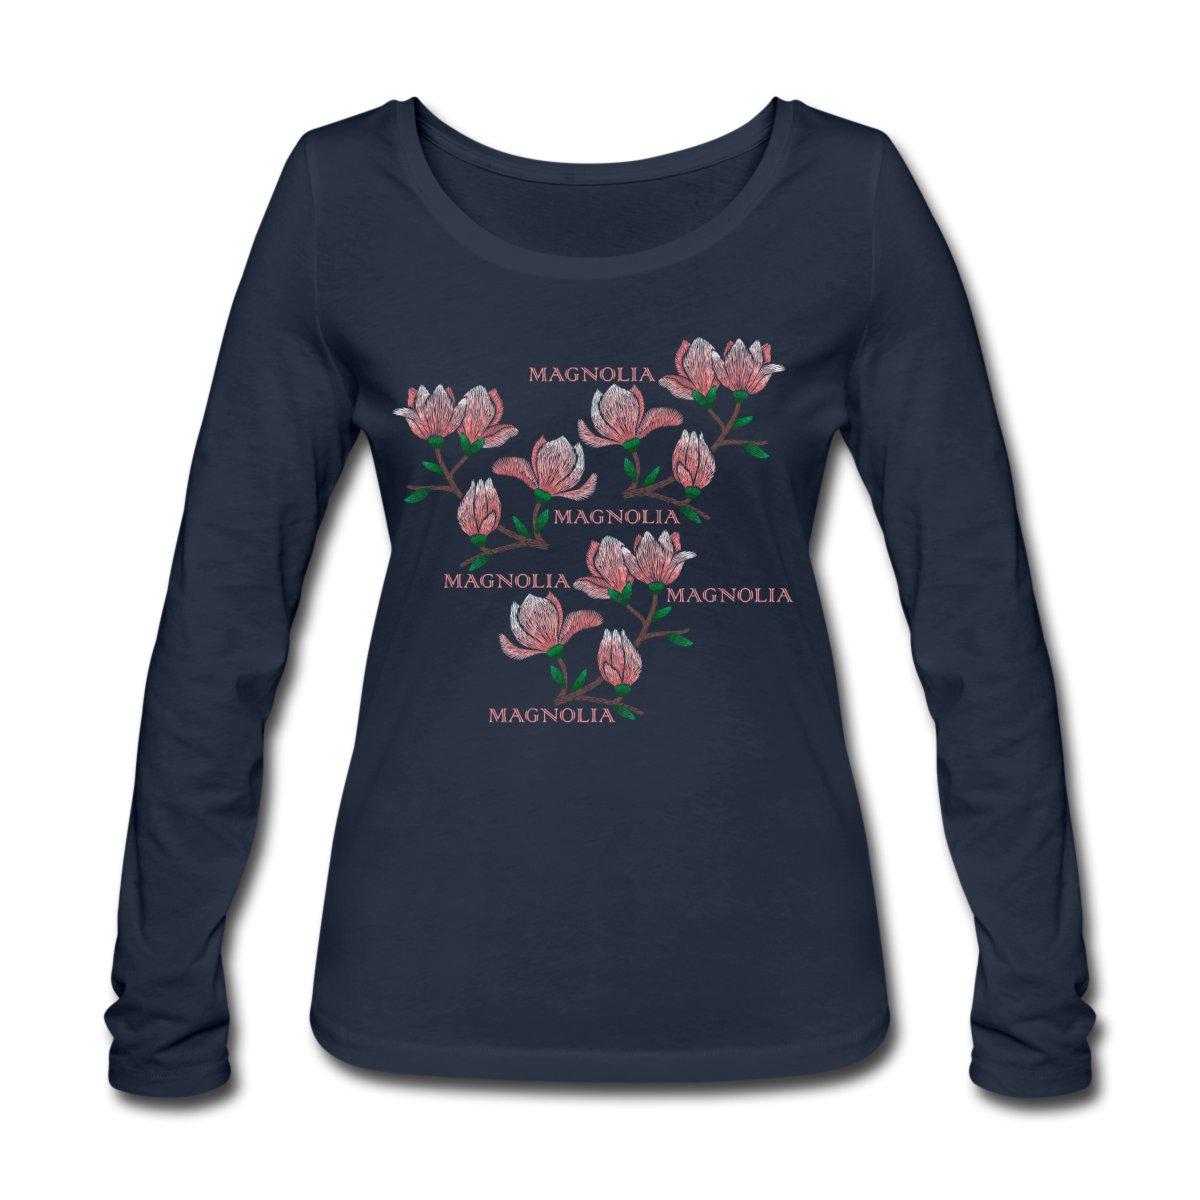 magnolia-ekologisk-laangaermad-t-shirt-dam-m.jpg